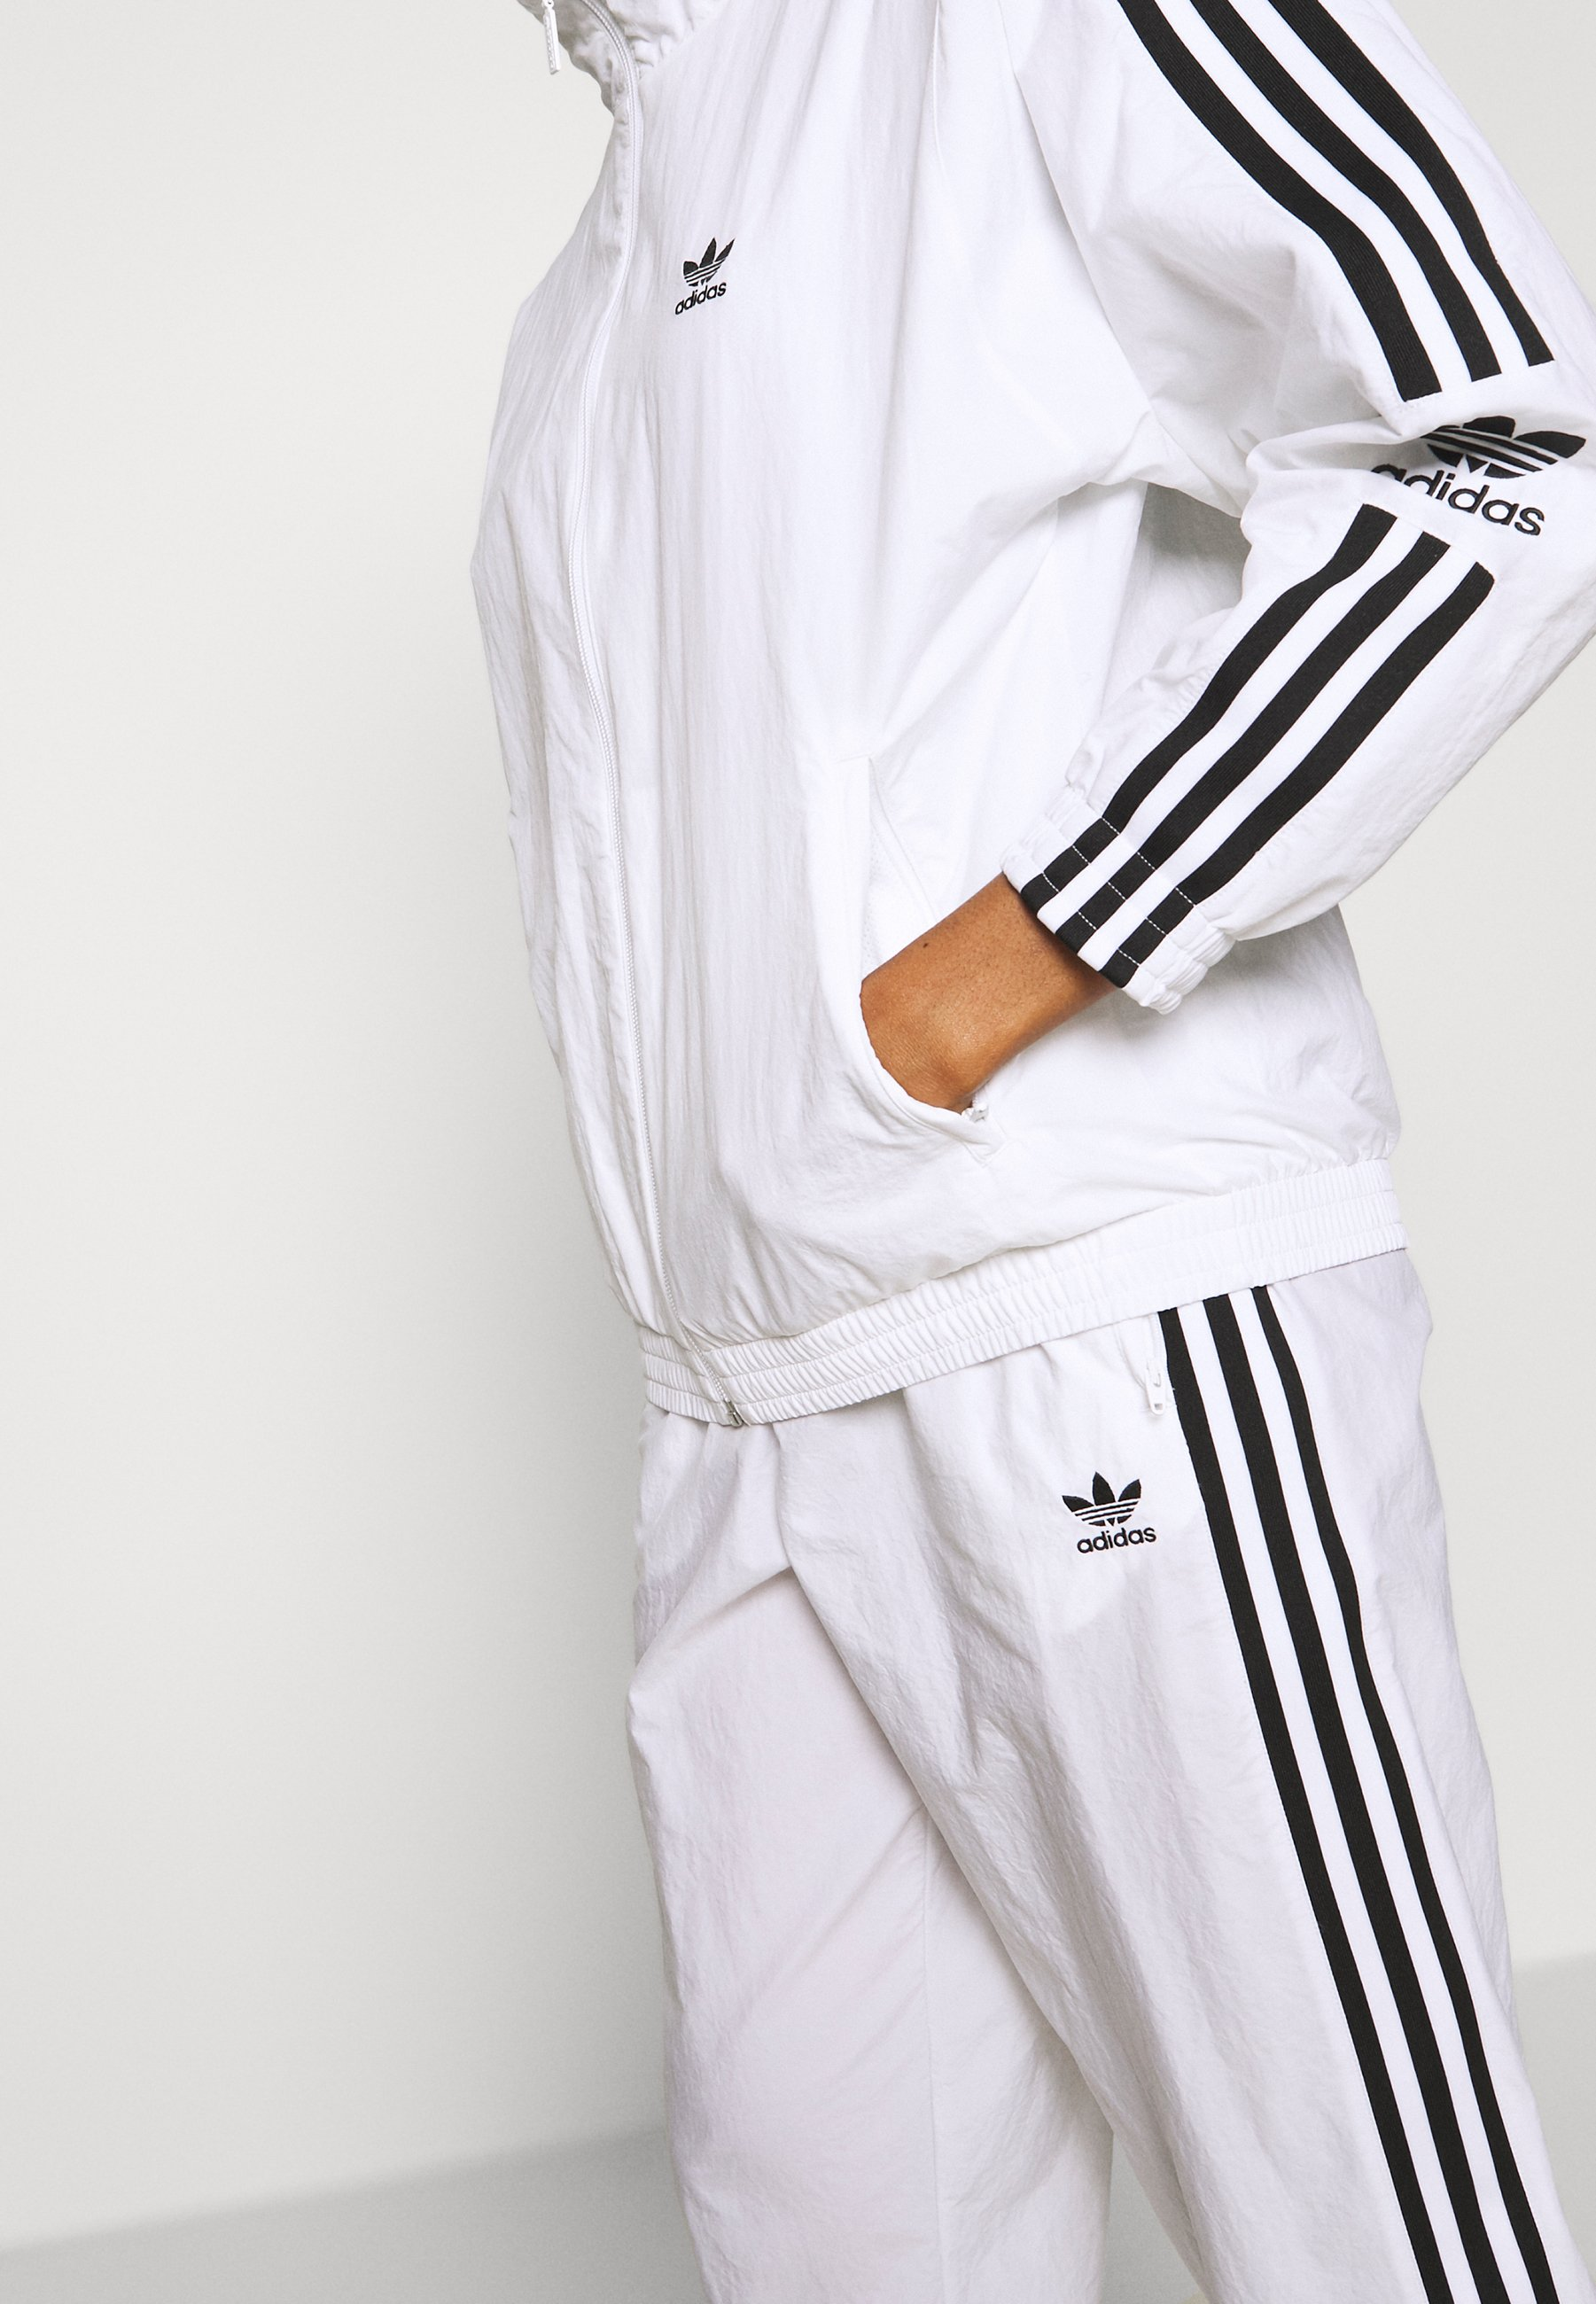 Adidas Originals Adicolor Sport Inspired Nylon Jacket - Giacca A Vento White sLlGztE